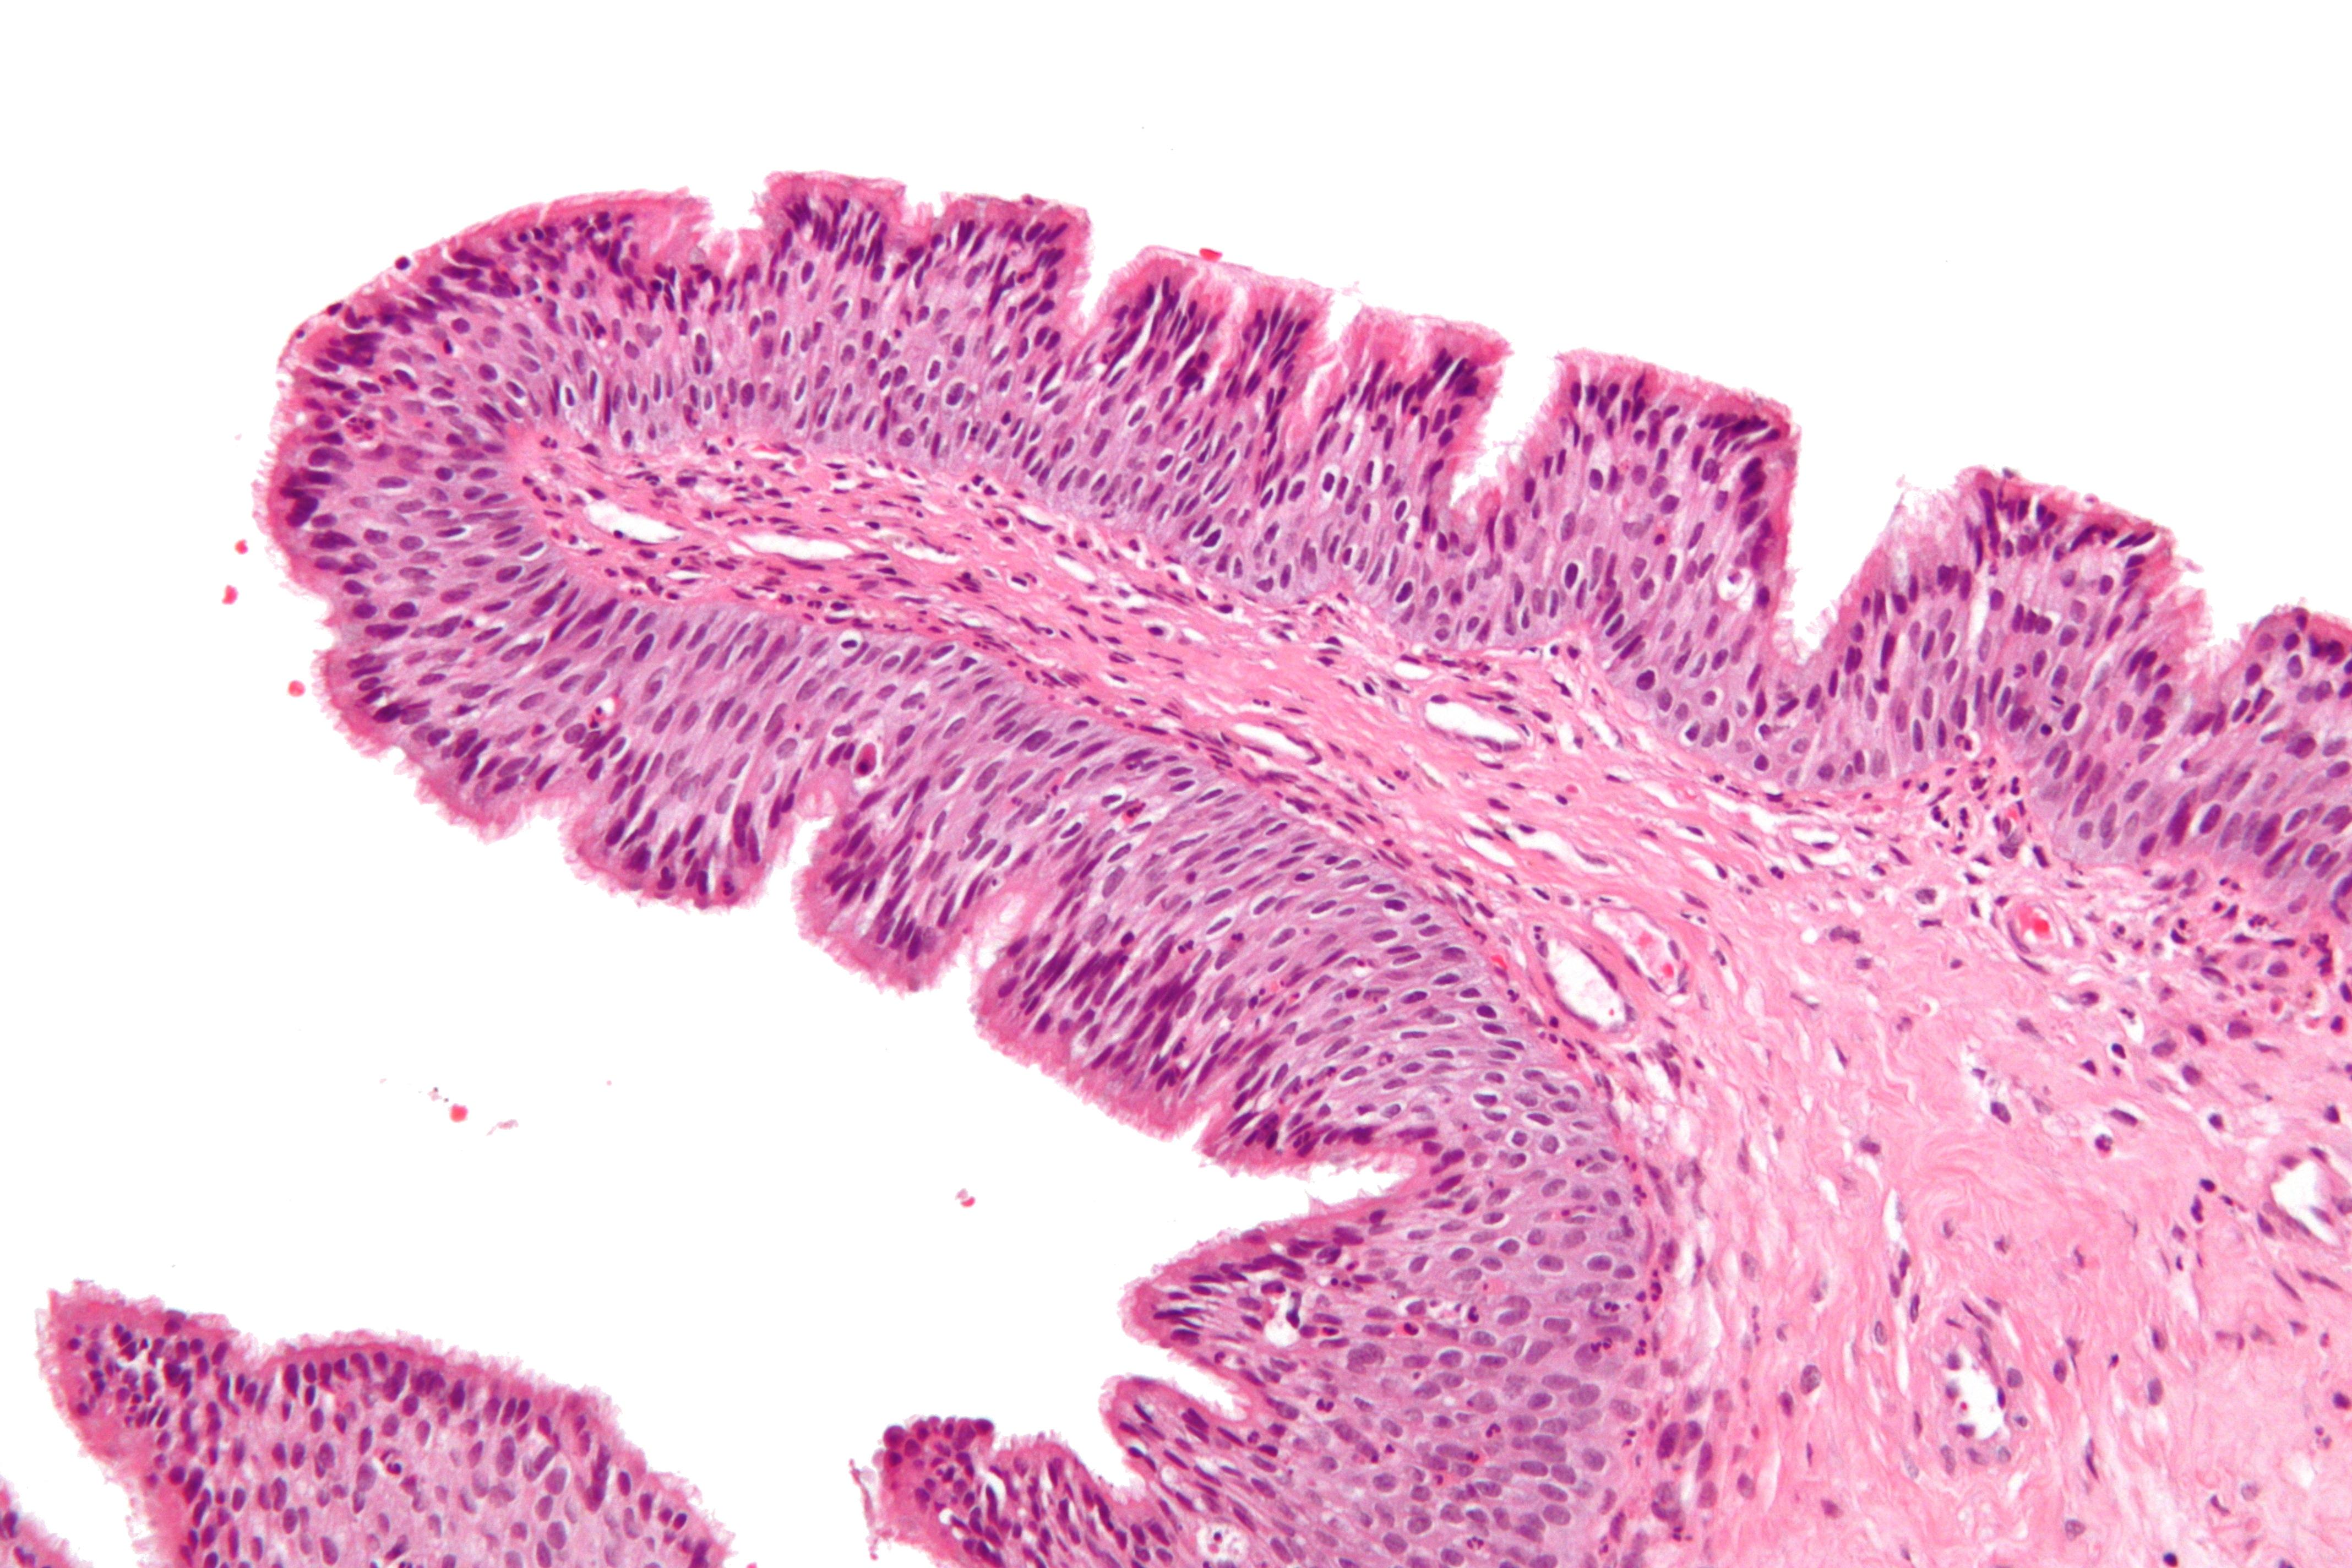 papilloma nasal polyposis human papillomavirus symptoms female